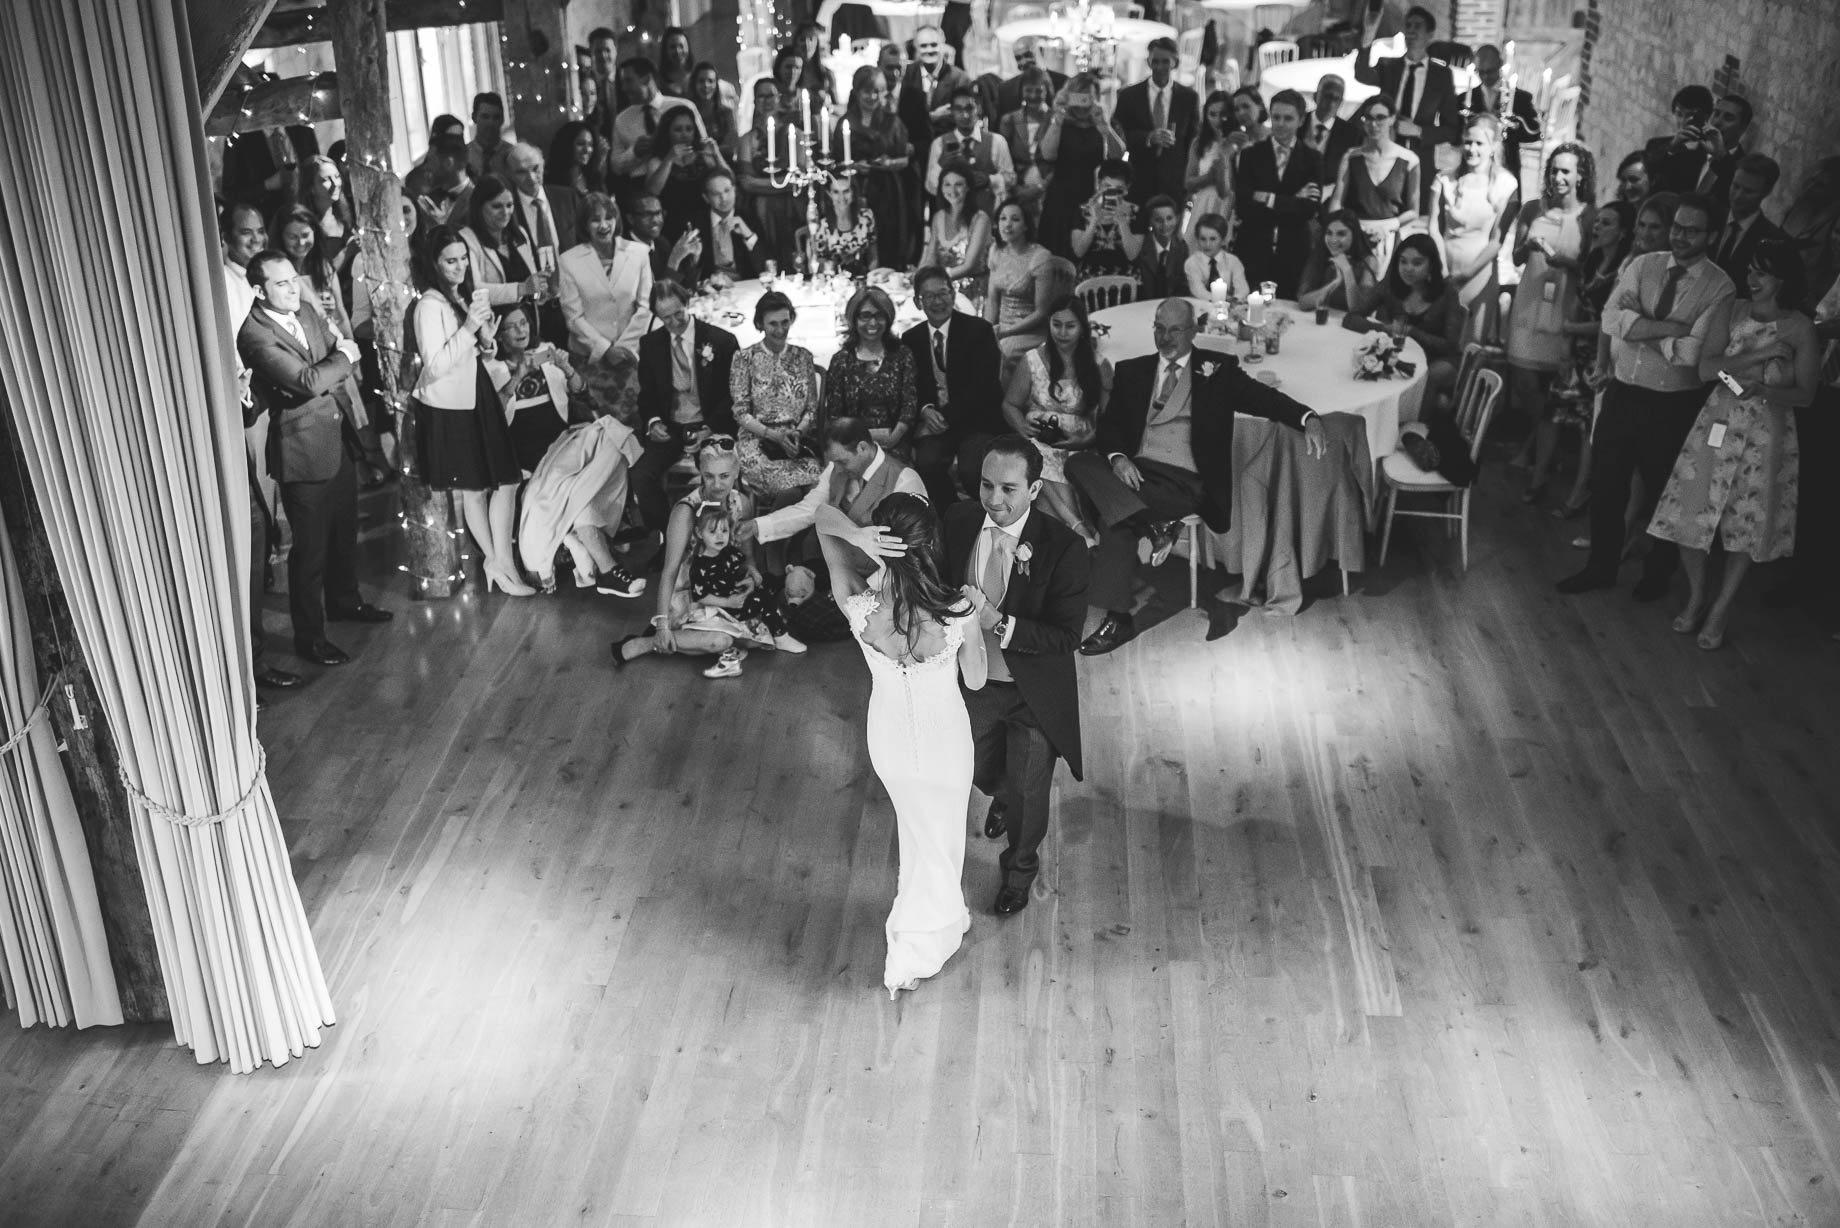 Bury Court Barn Wedding Photography - Caroline and Rob (195 of 219)